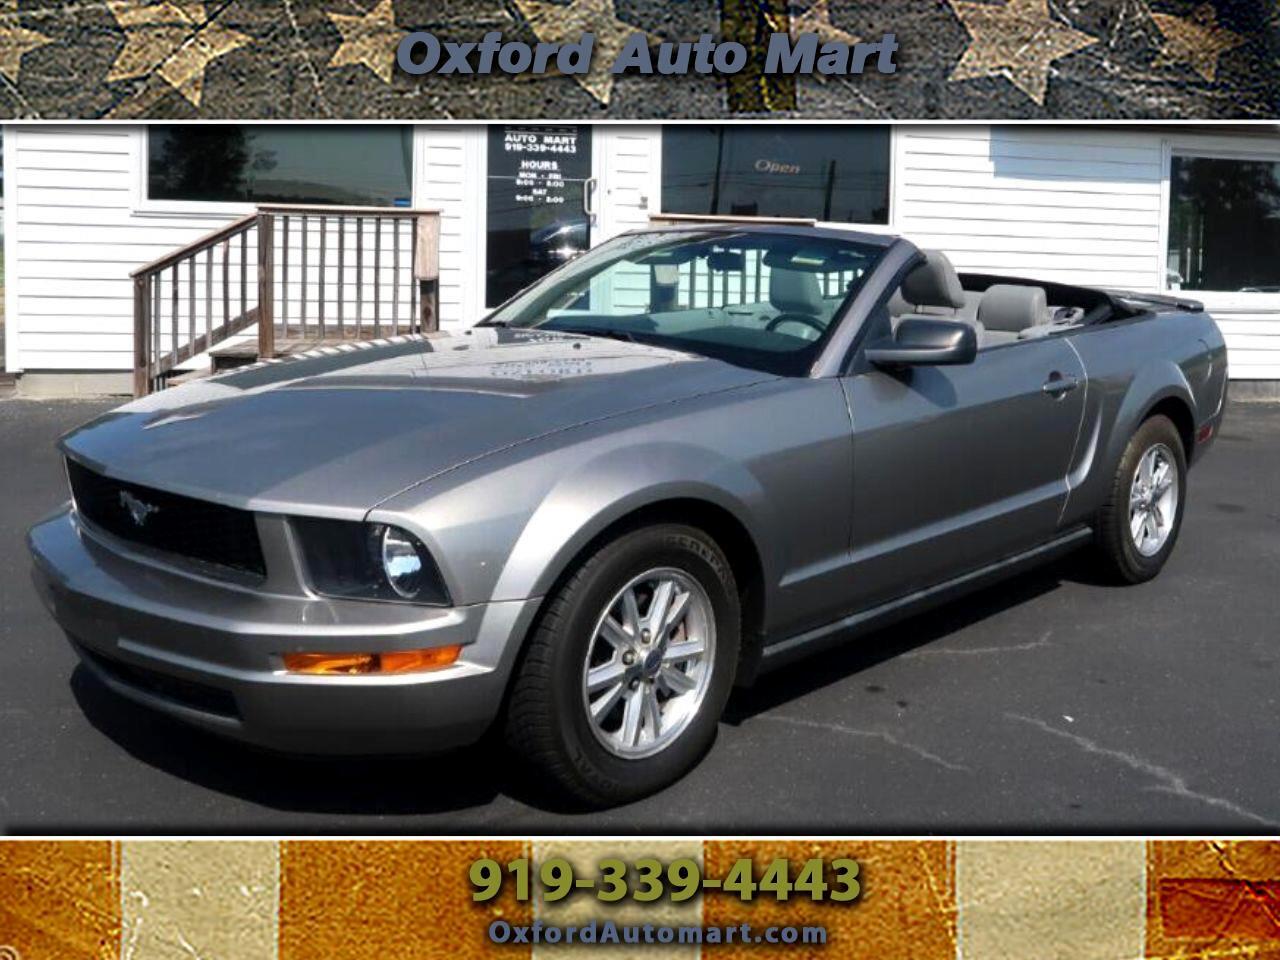 Ford Mustang V6 Premium Convertible 2008